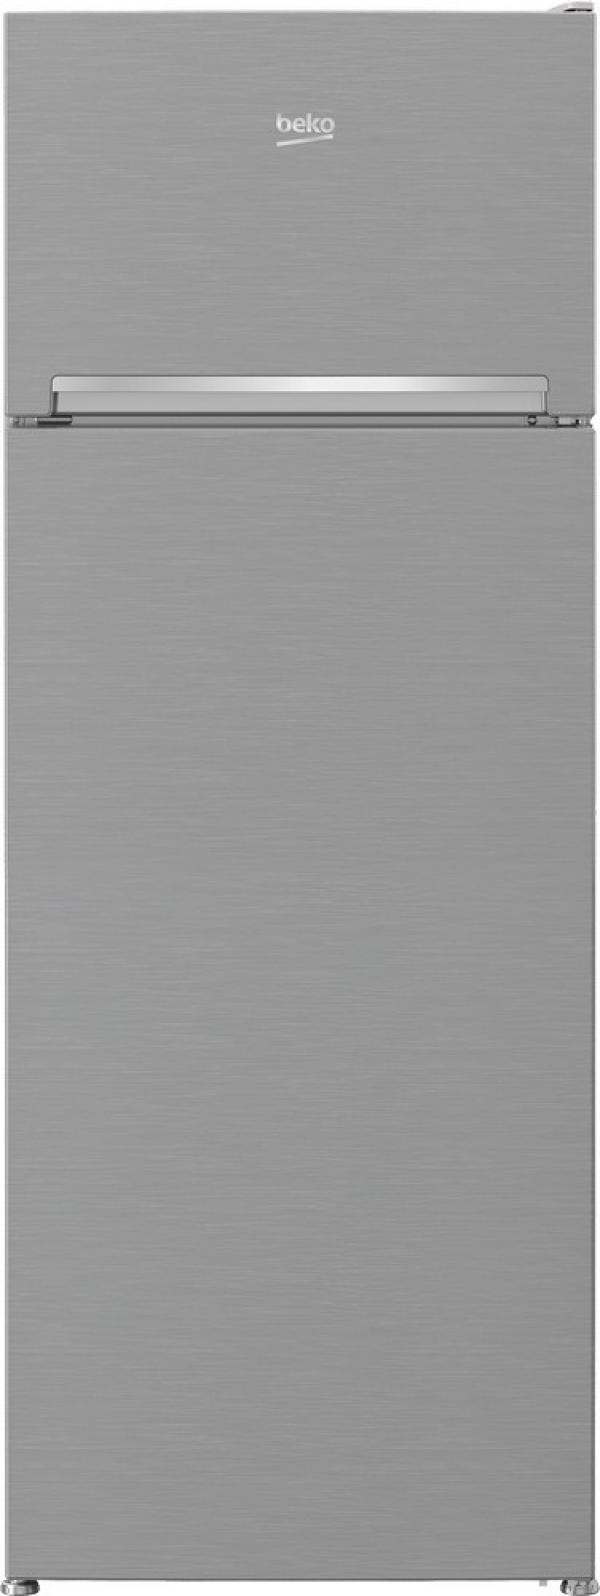 BEKO Kombinovani frižider RDSA240 K 20 XB